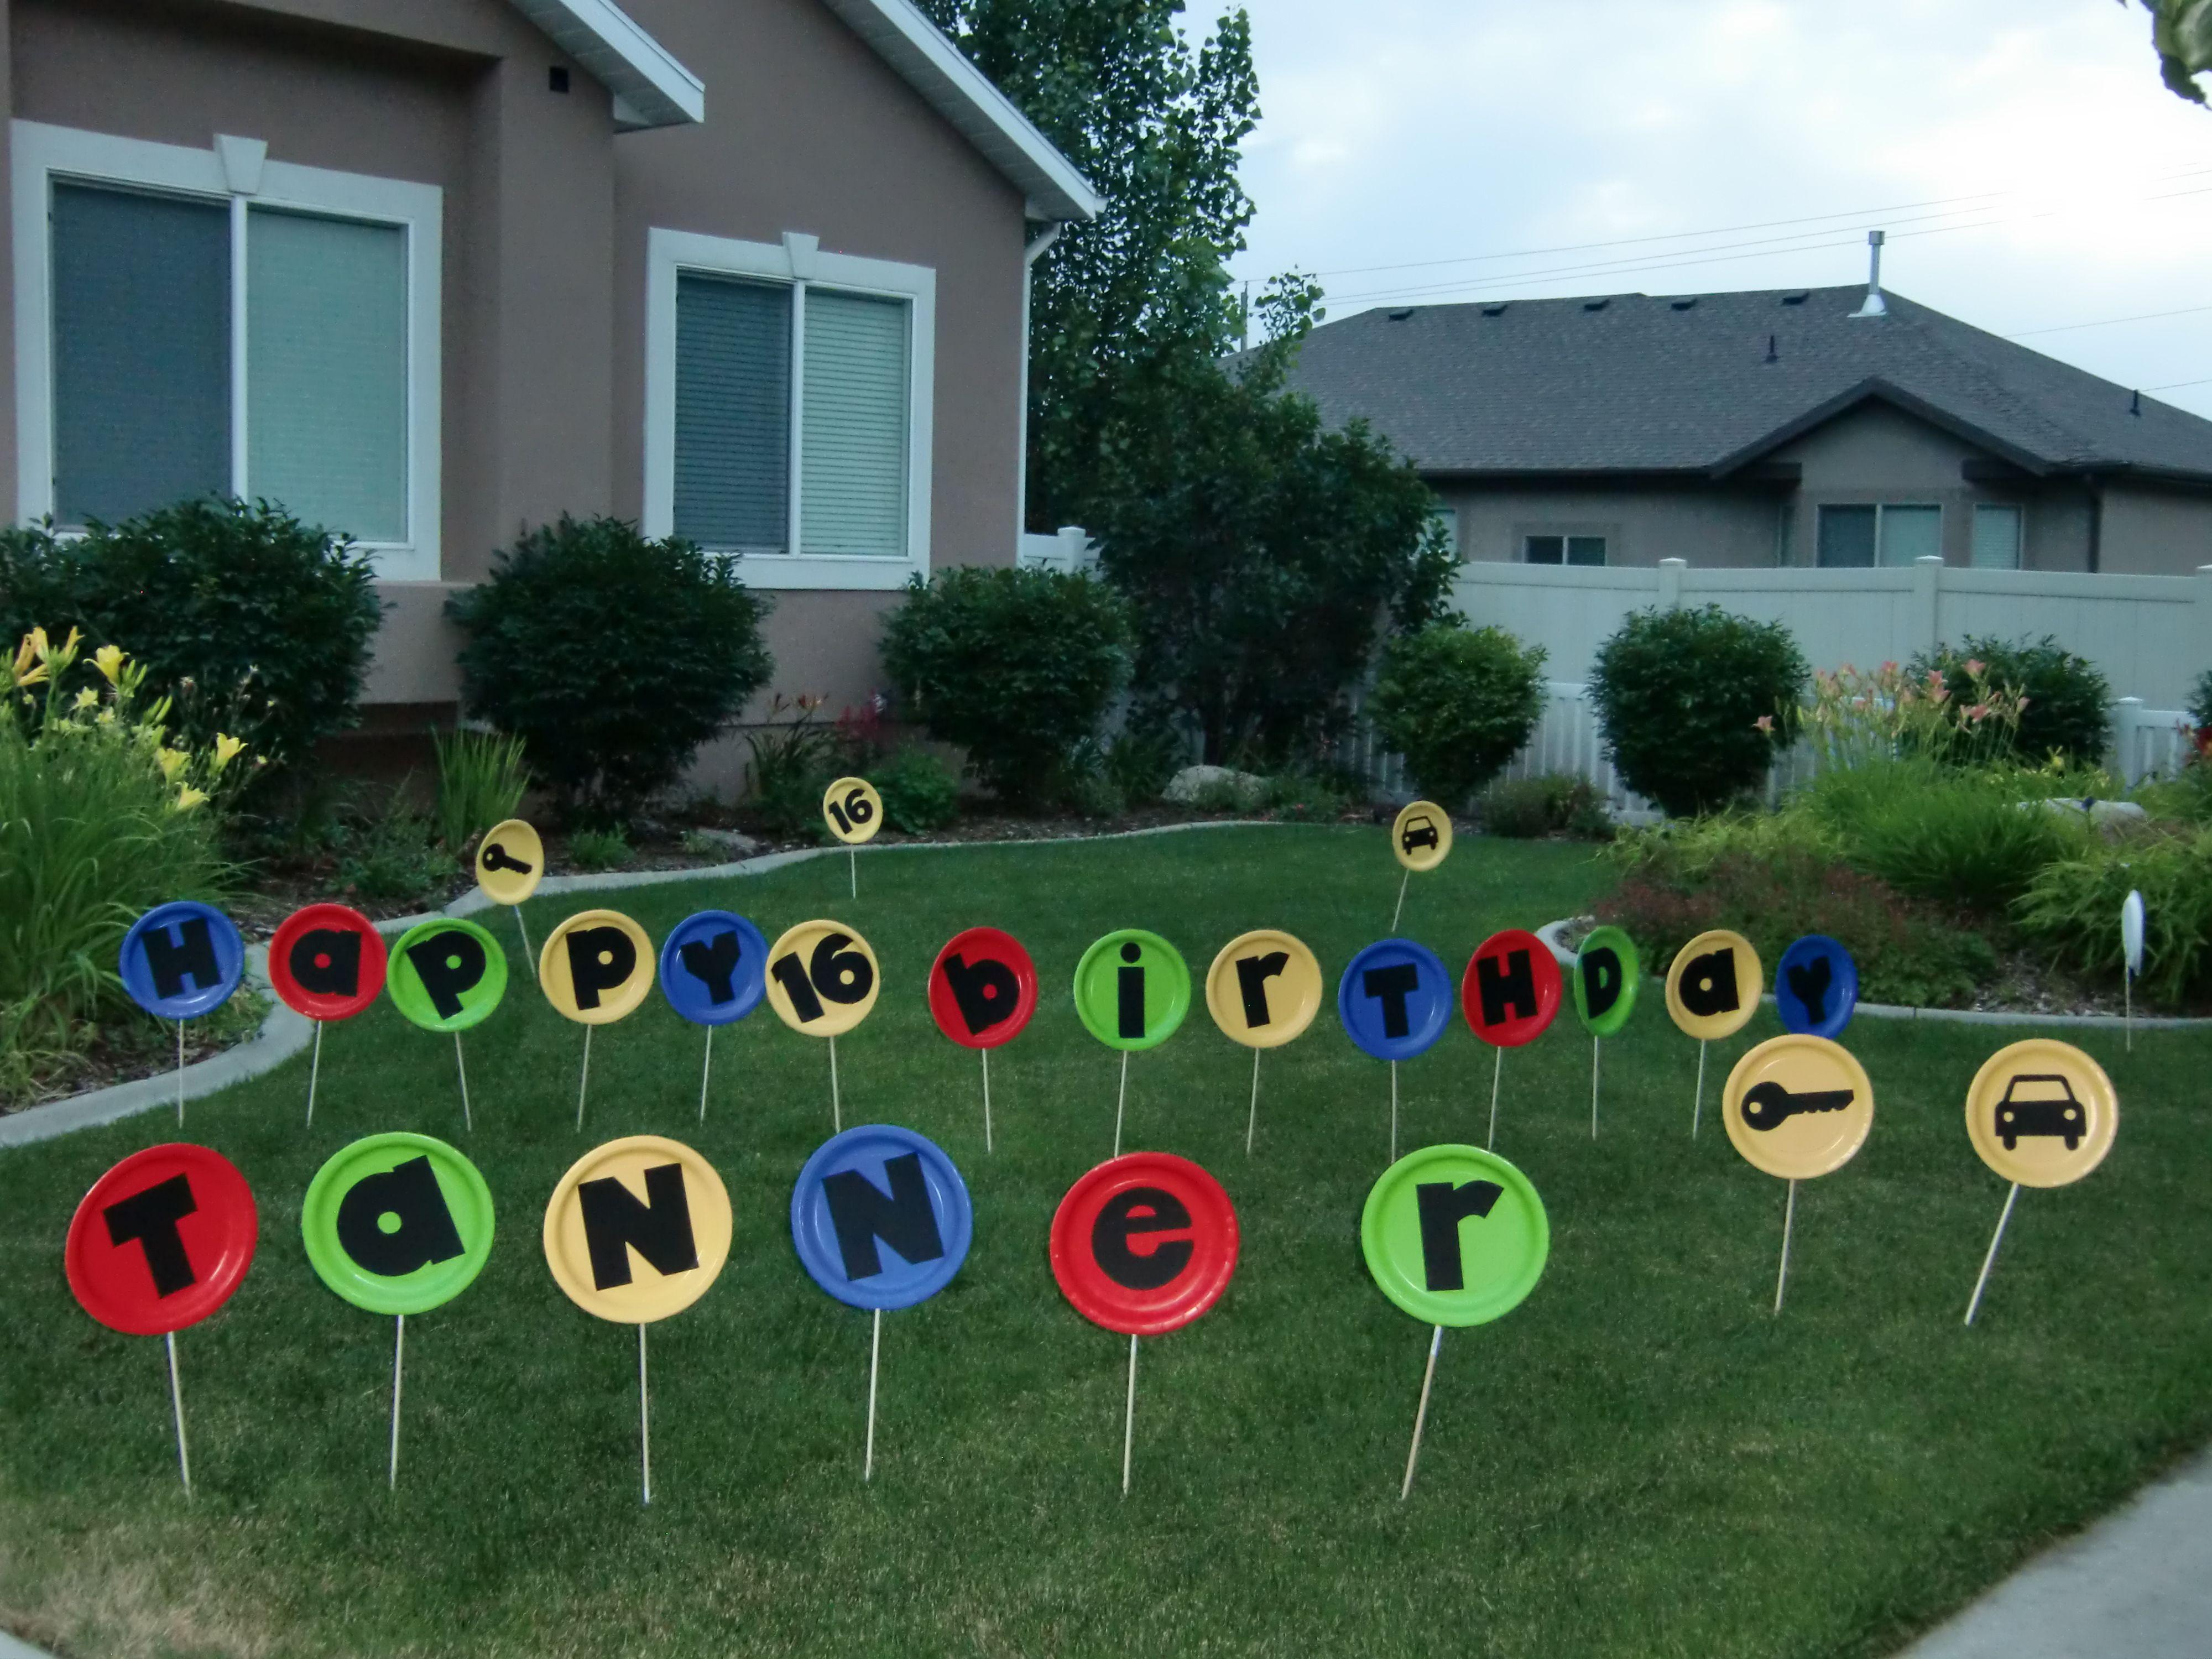 Pin By Gertrudis Almodovar On Birthday Ideas Boy 16th Birthday Birthday Return Gifts Birthday Fun